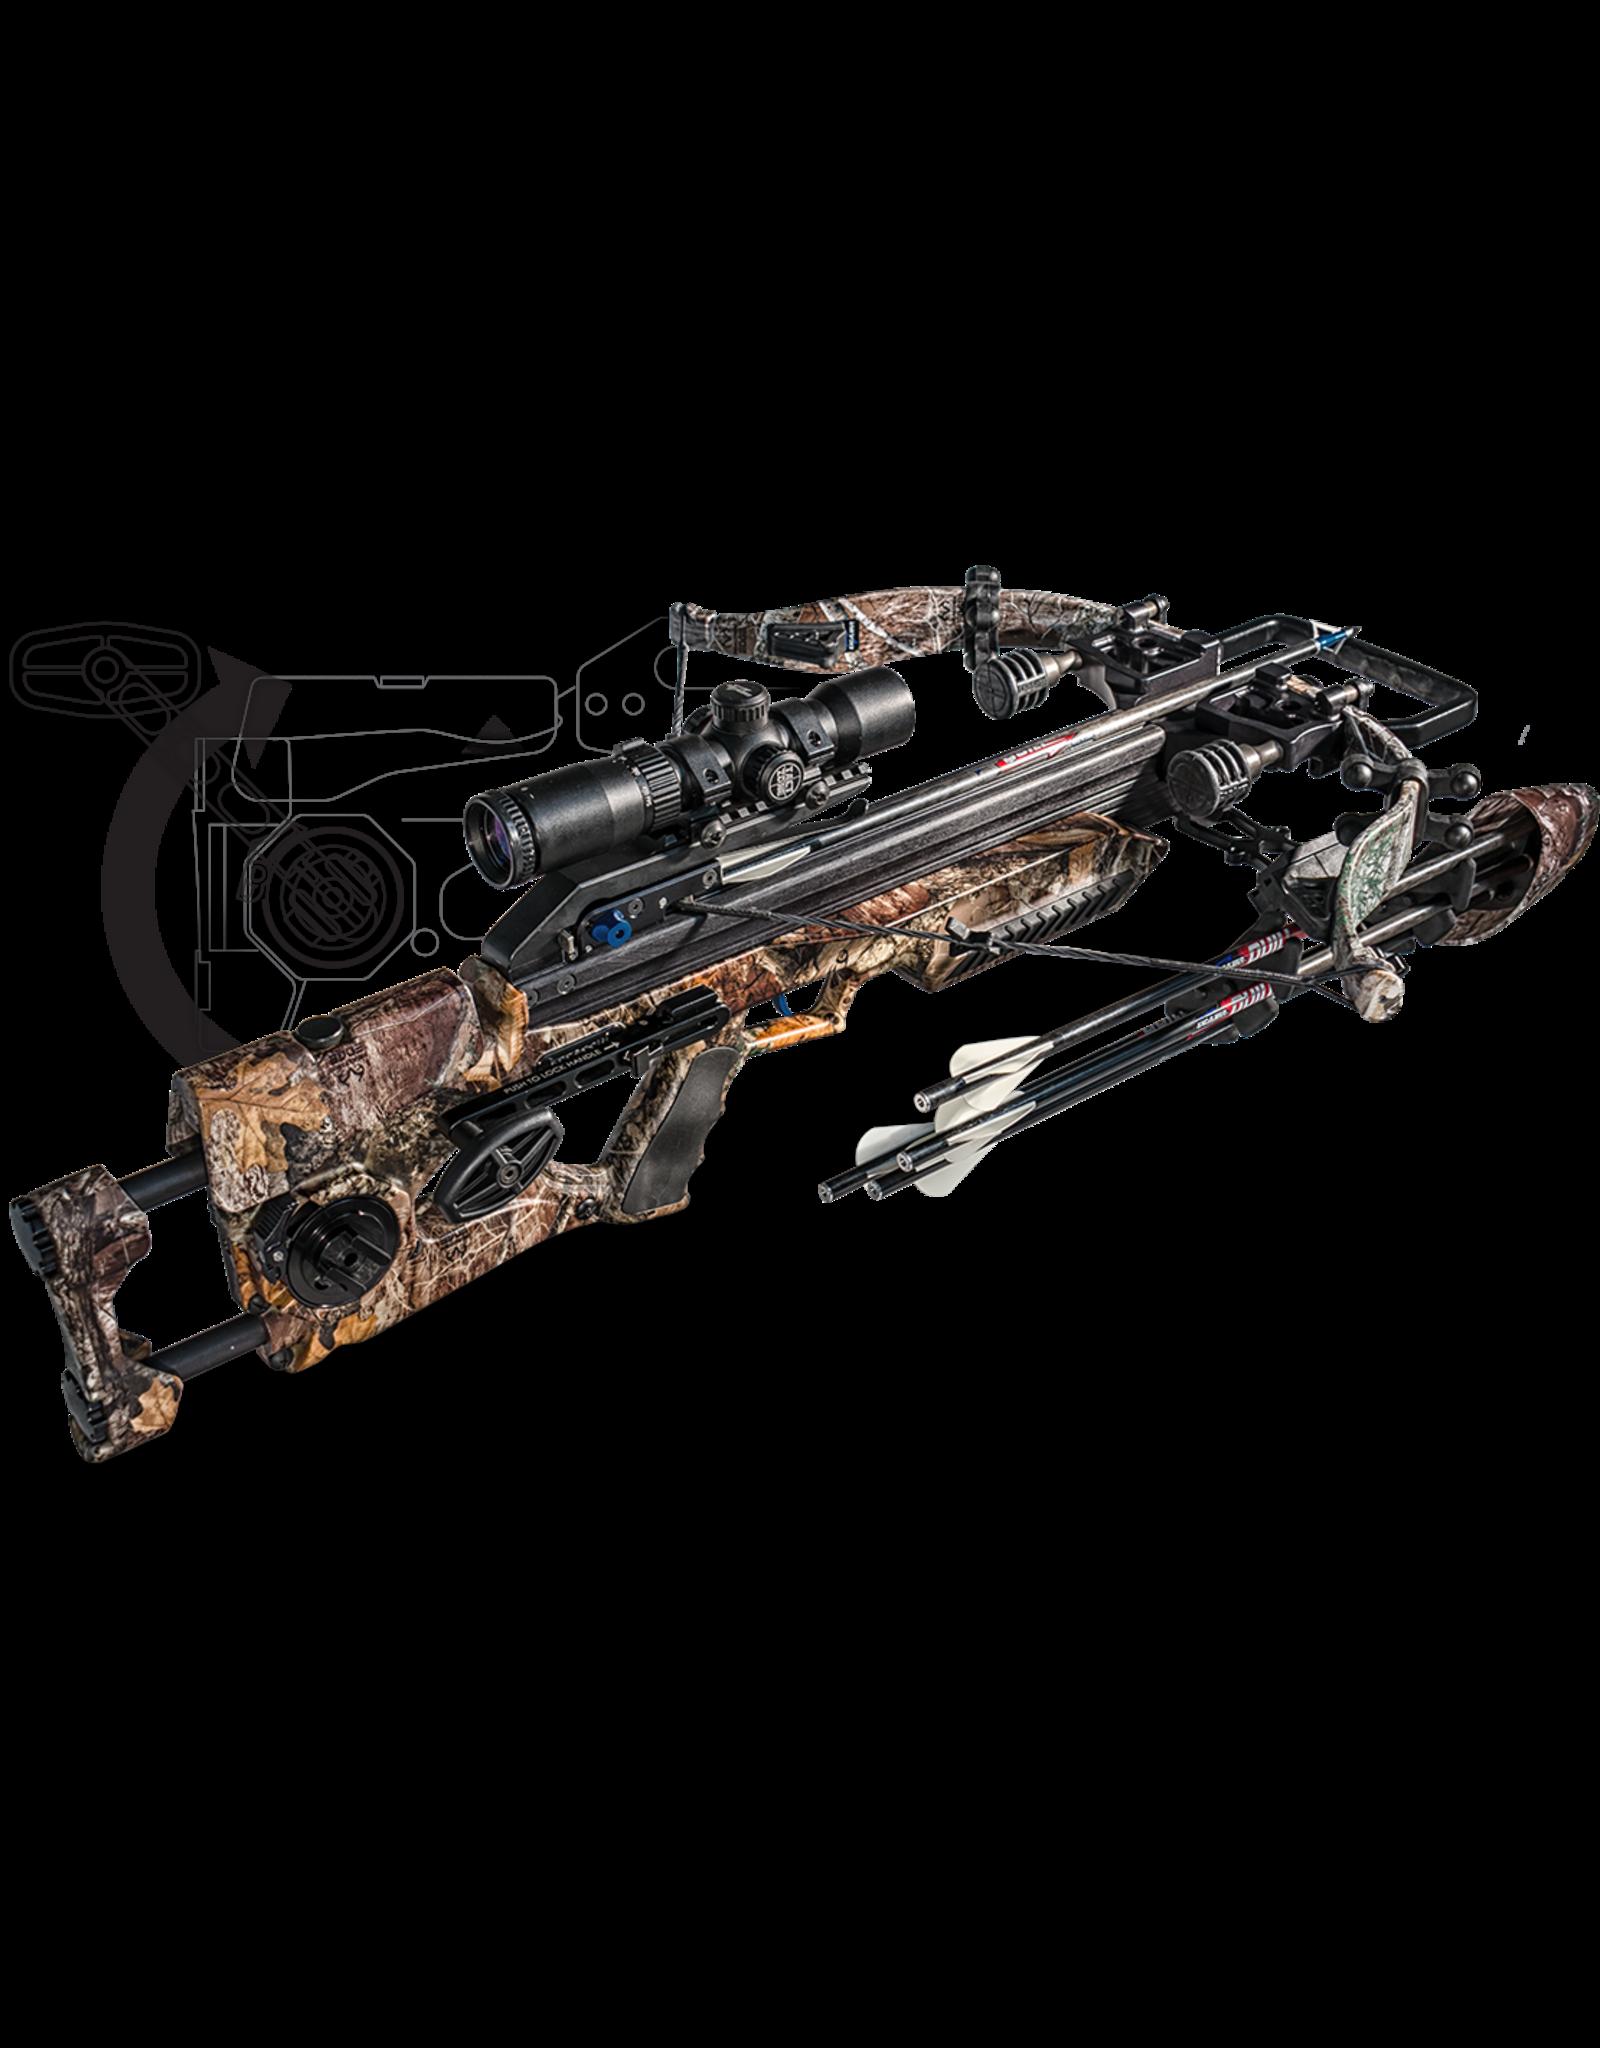 Excalibur Crossbows EXCALIBUR ASSASSIN 360 STRATA CROSSBOW #E73367